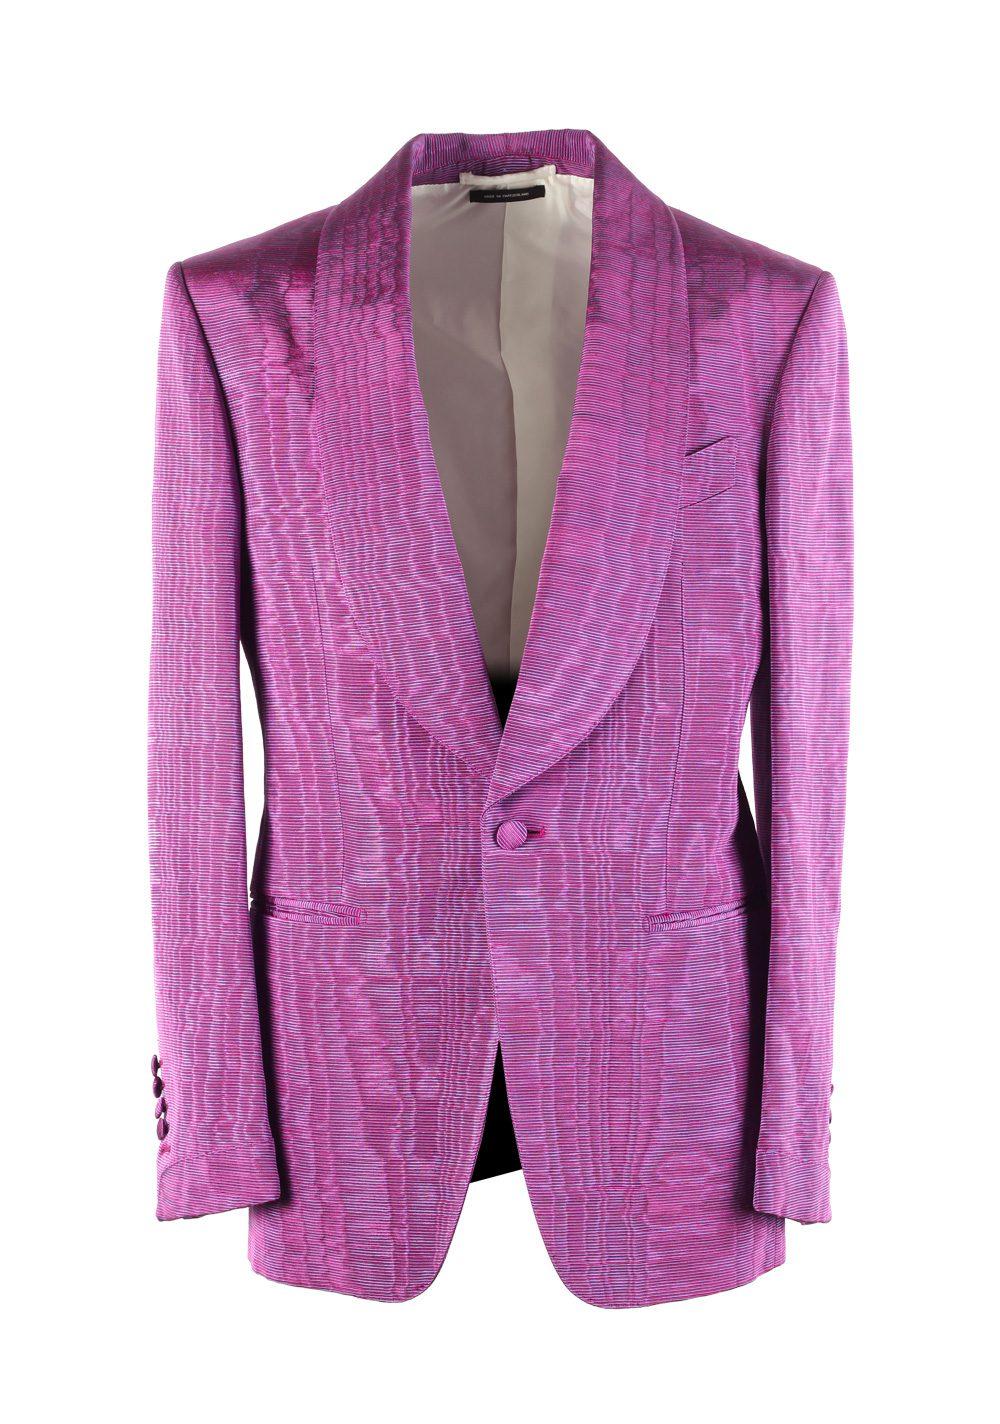 TOM FORD Shelton Pink Tuxedo Dinner Jacket Size 46 / 36R U.S. | Costume Limité